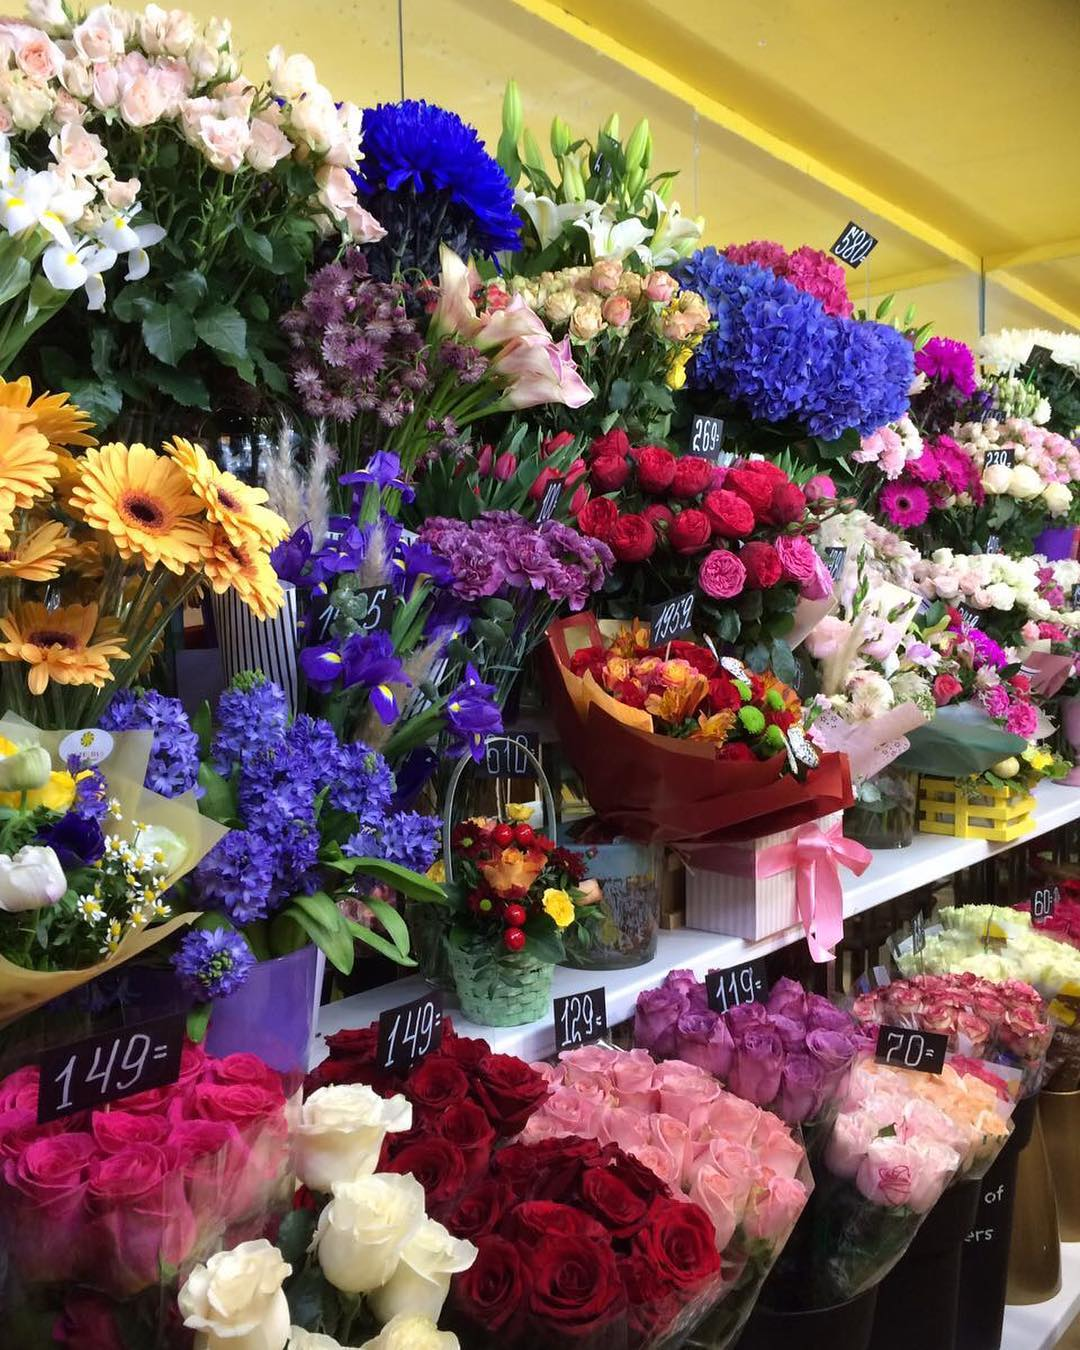 Серпухов, доставка цветов амстердам москва